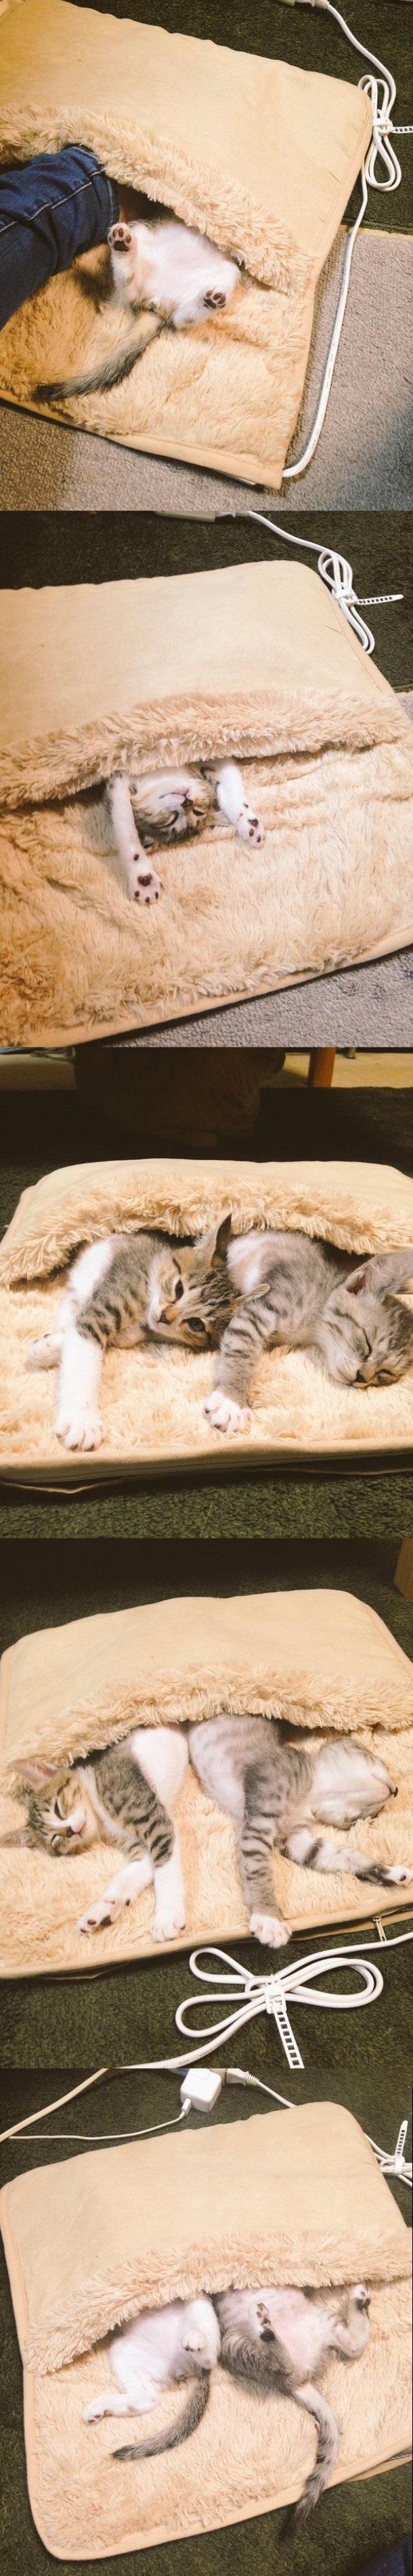 cat warmer.jpg